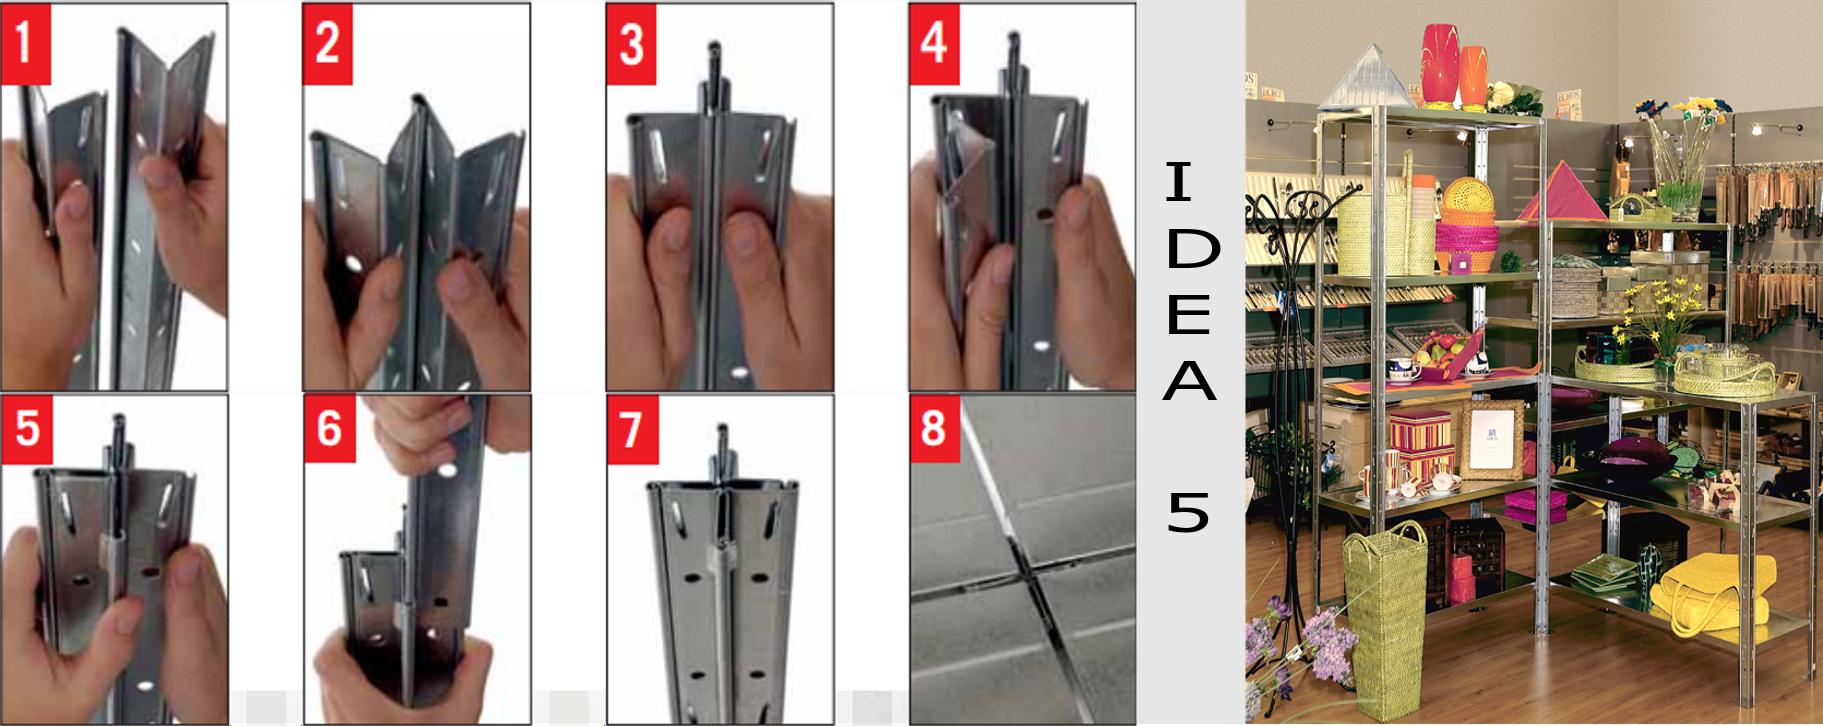 Rafturi Idea5 depozitare usoara 7